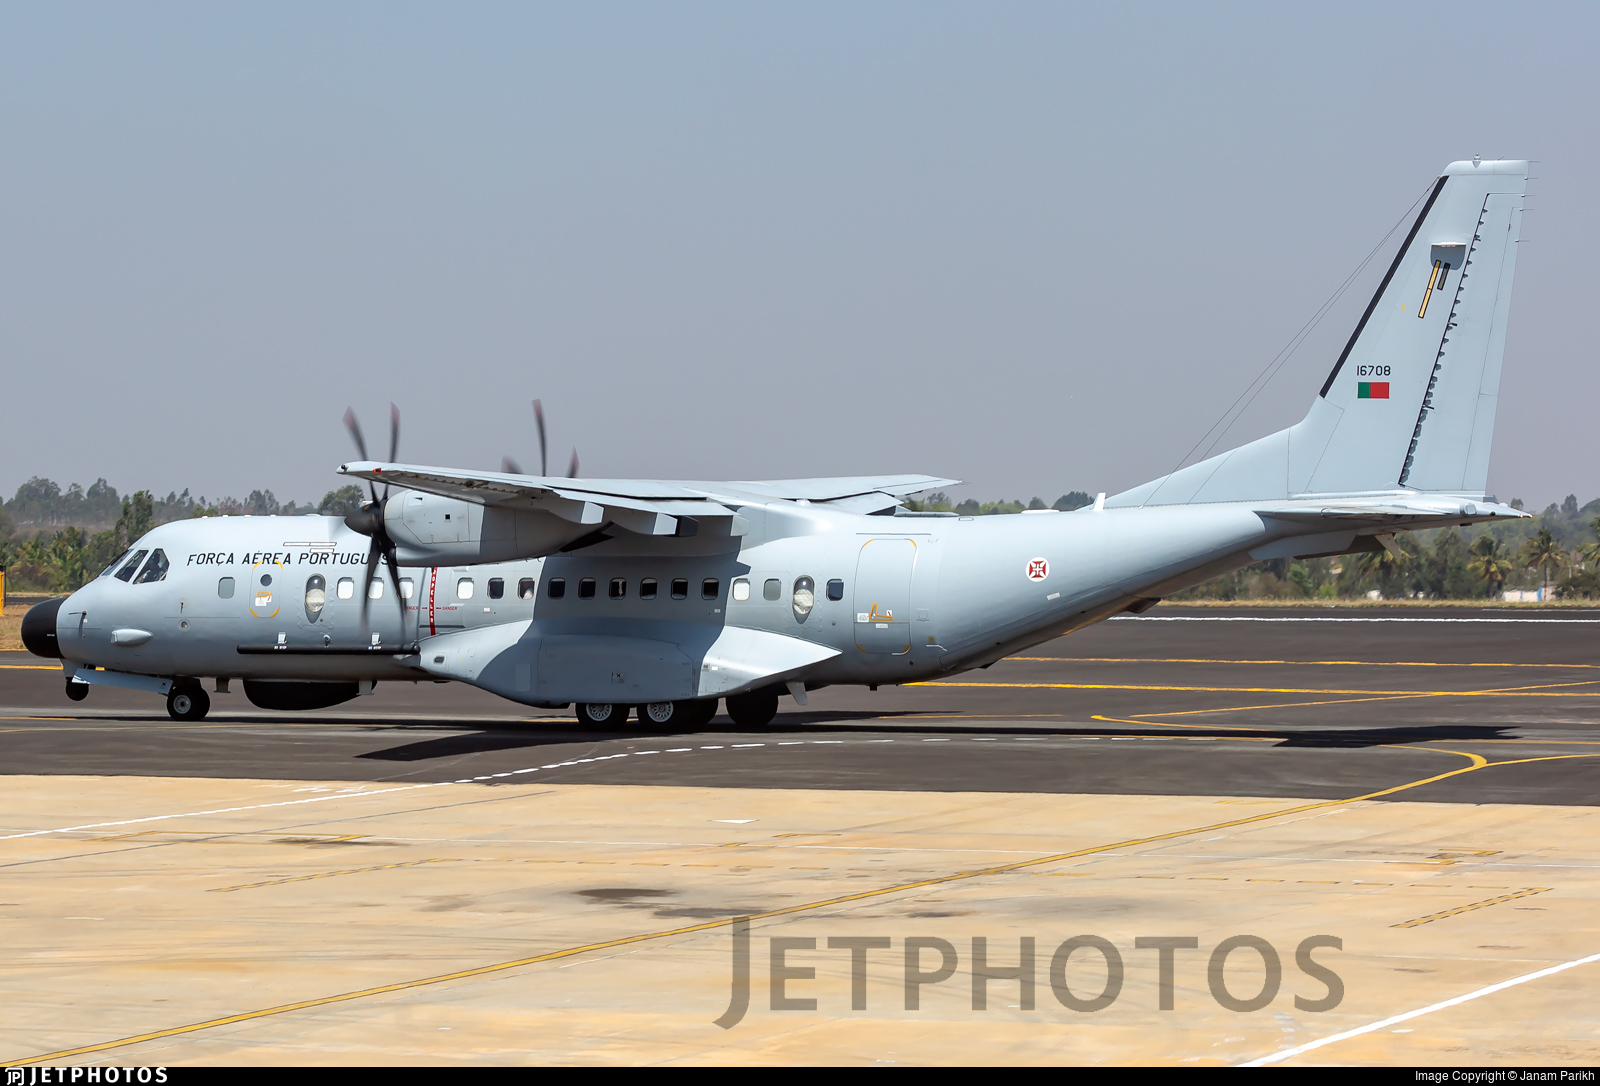 16708 - CASA C-295MP Persuader - Portugal - Air Force